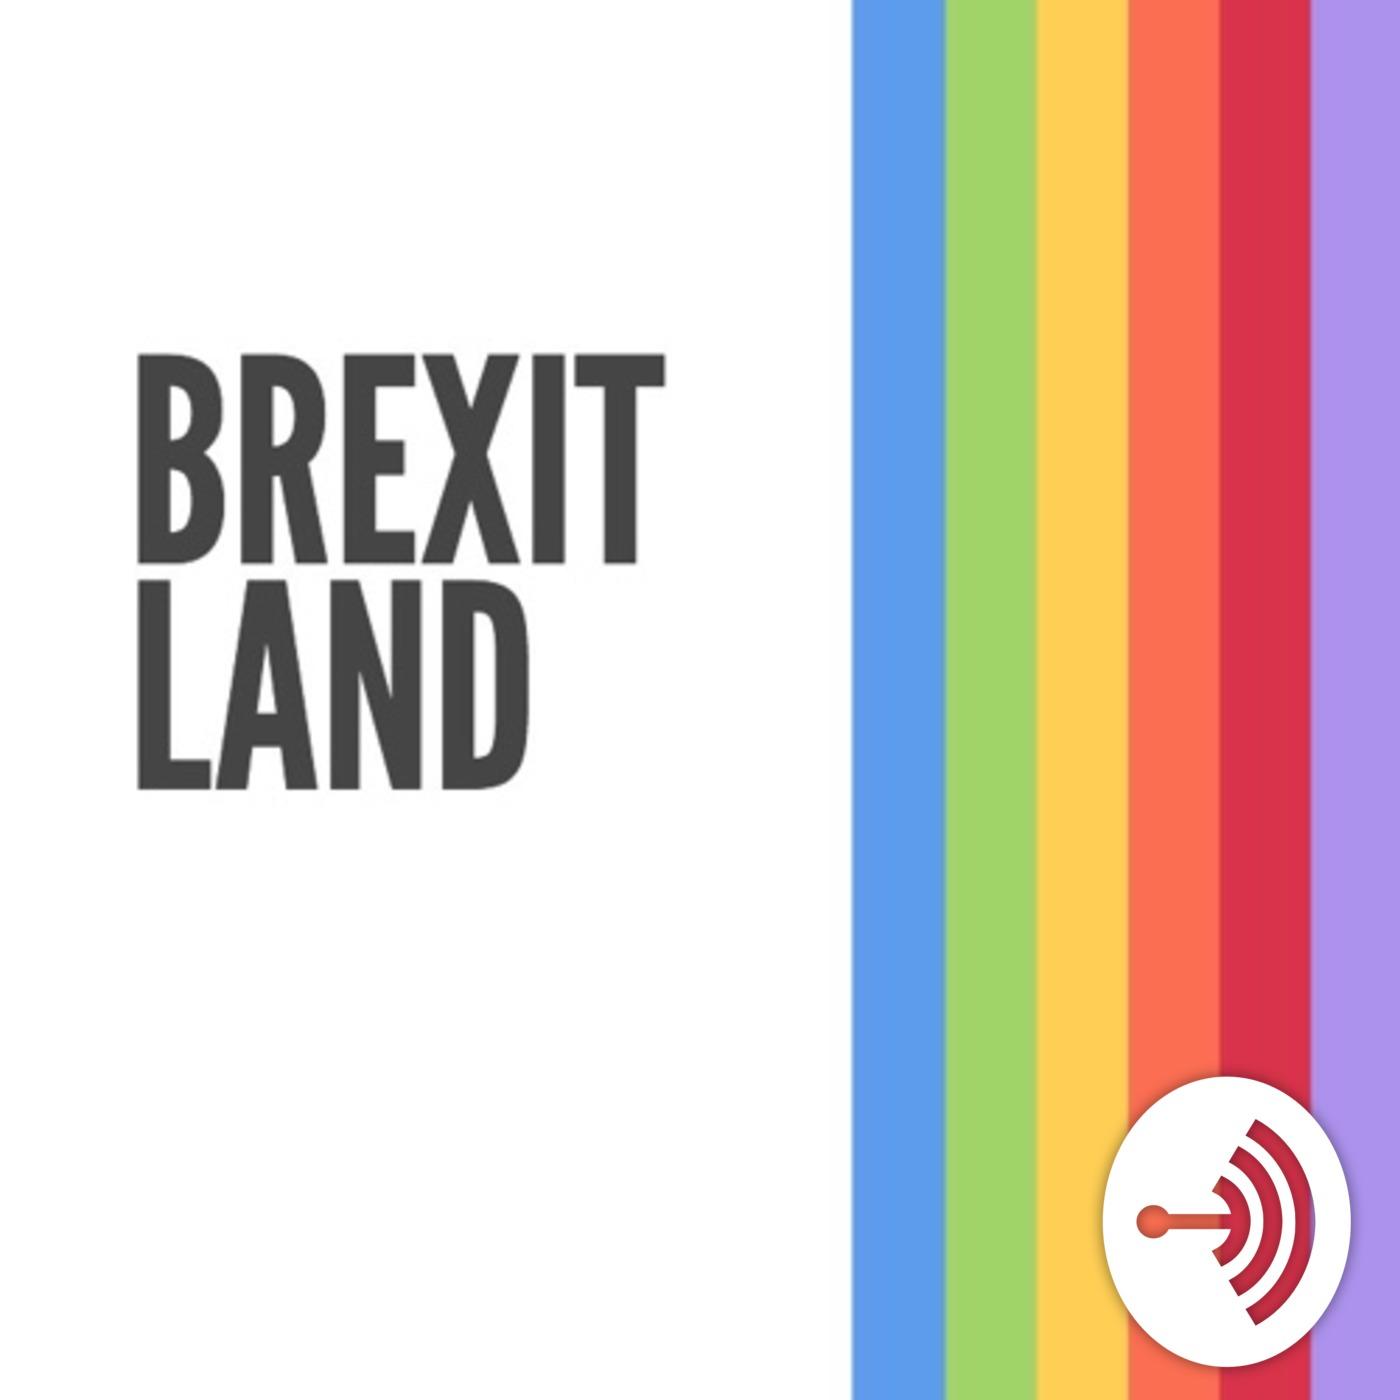 <![CDATA[Brexitland]]>